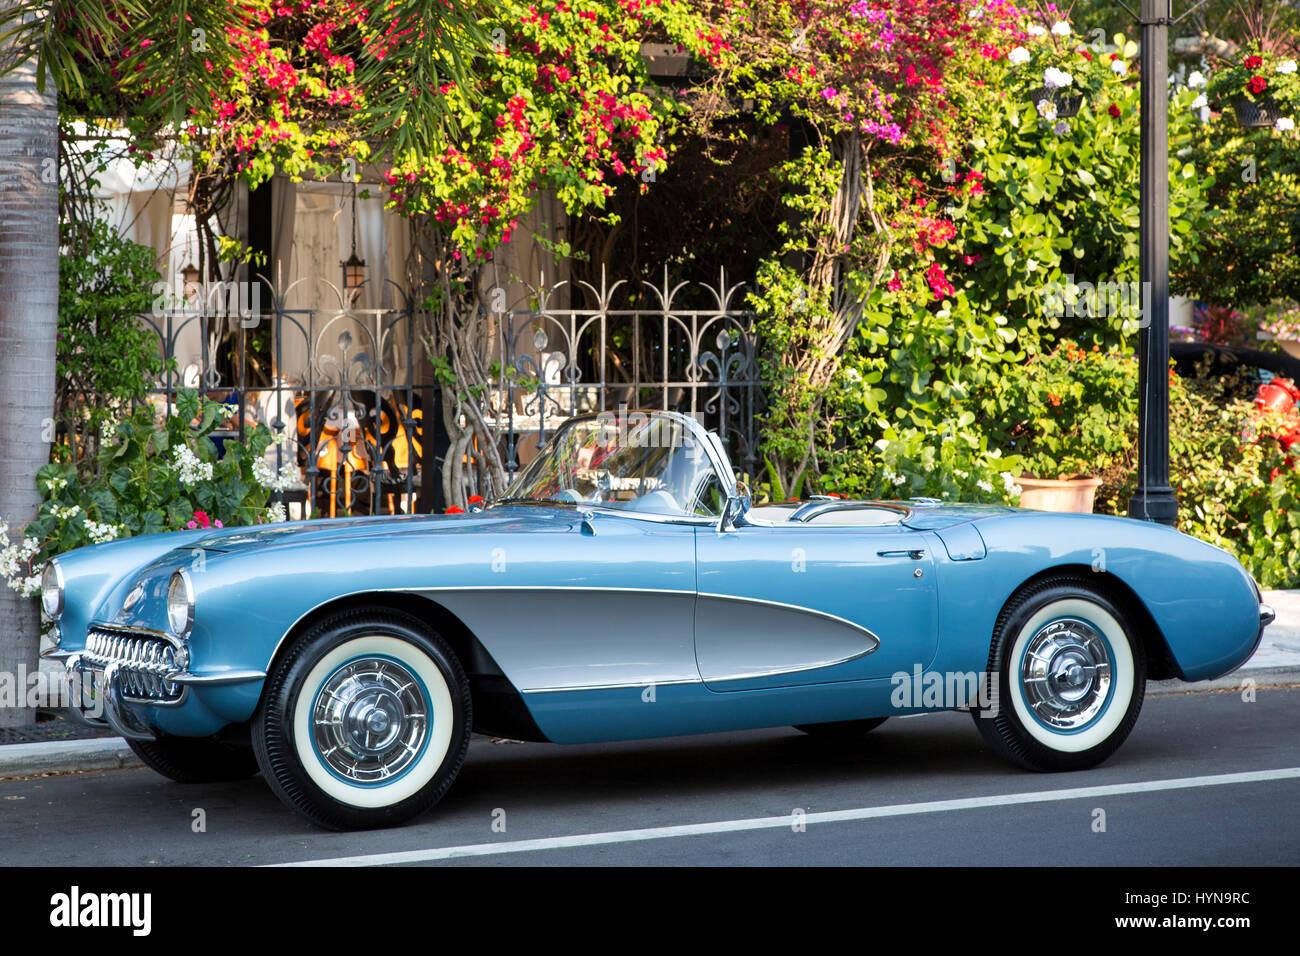 1957 chevrolet corvette stingray parked in downtown naples florida usa stock photo